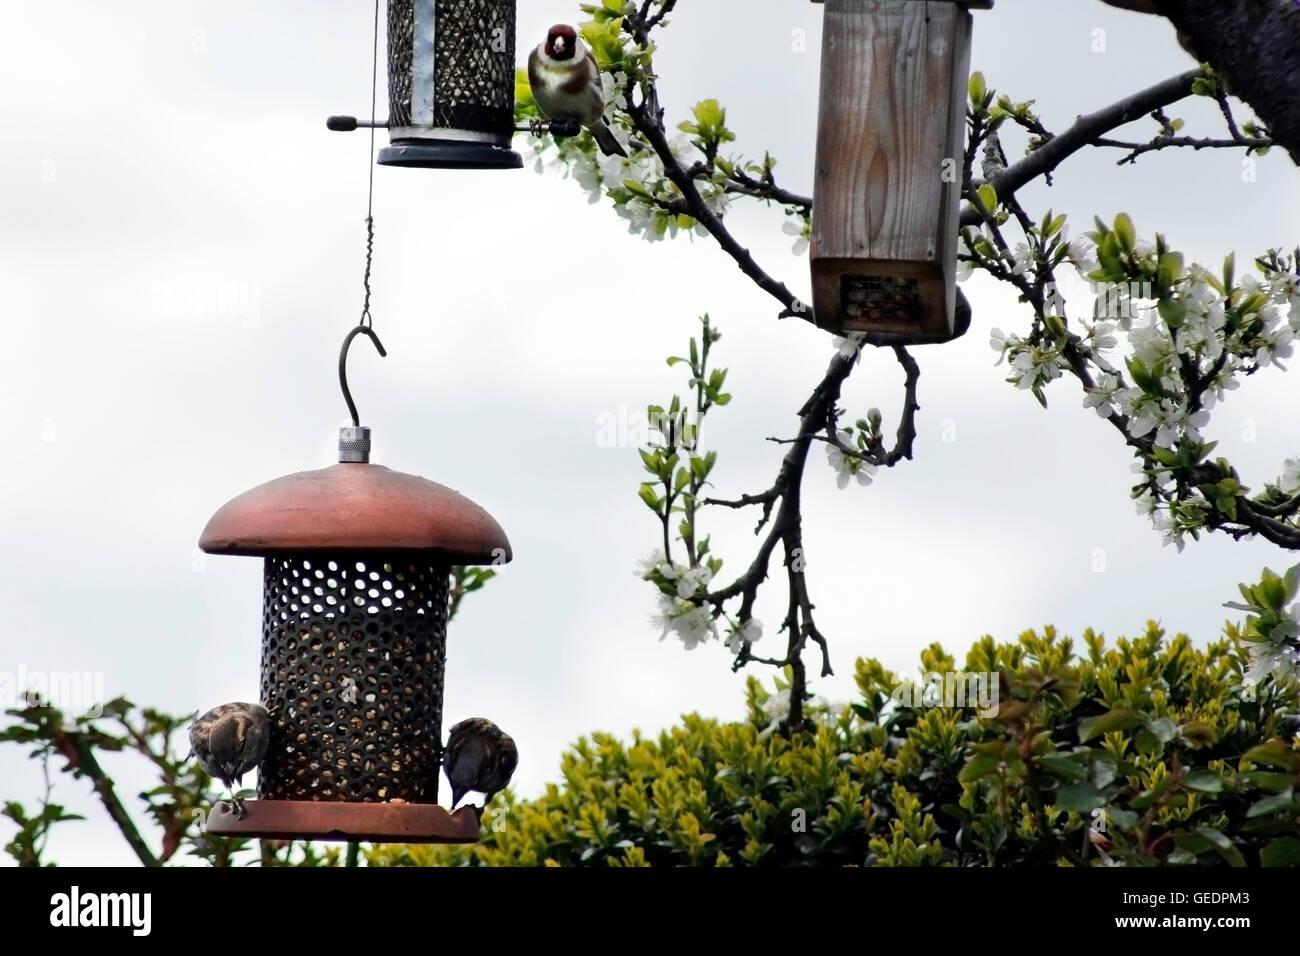 Varieties of  wild birds feeding in an English garden in summer - Stock Image